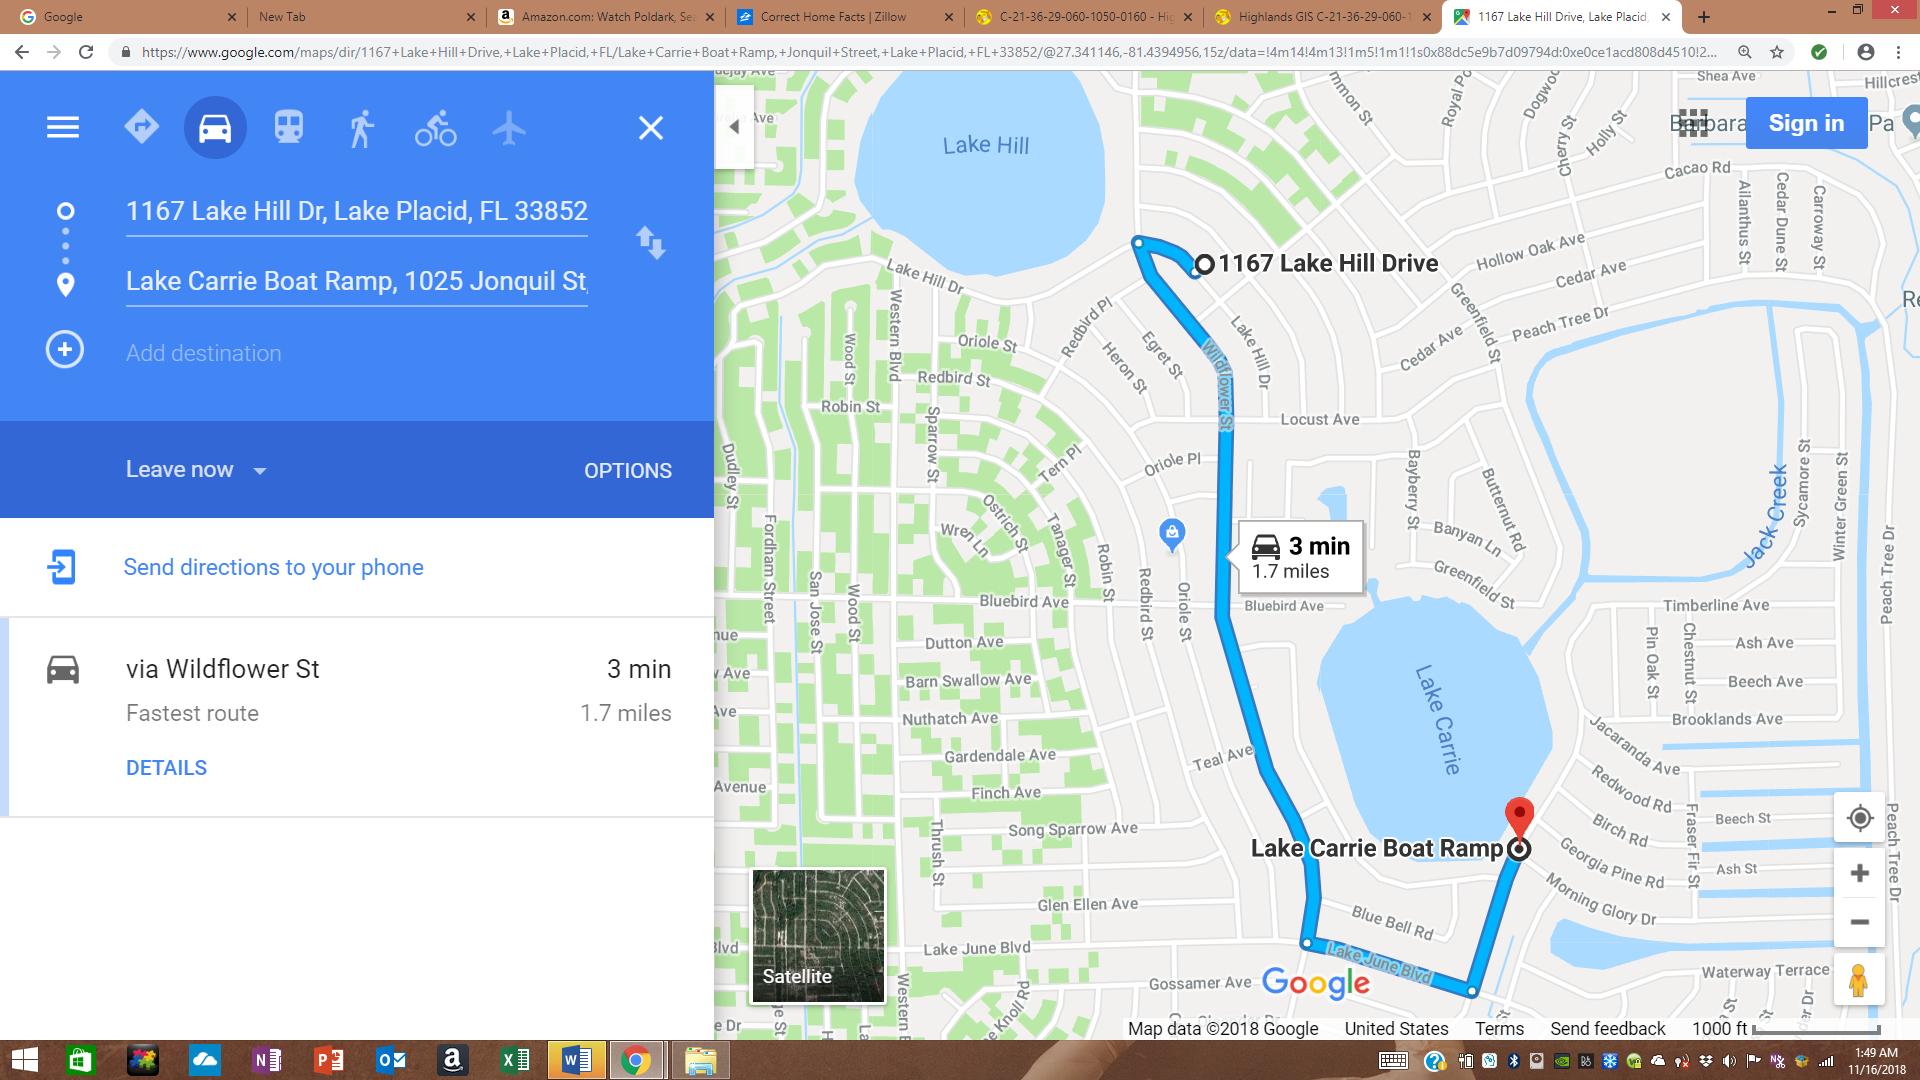 1167 Lake Hill Dr, Lake Placid, Fl 33852 | Realestate - Lake Placid Florida Map